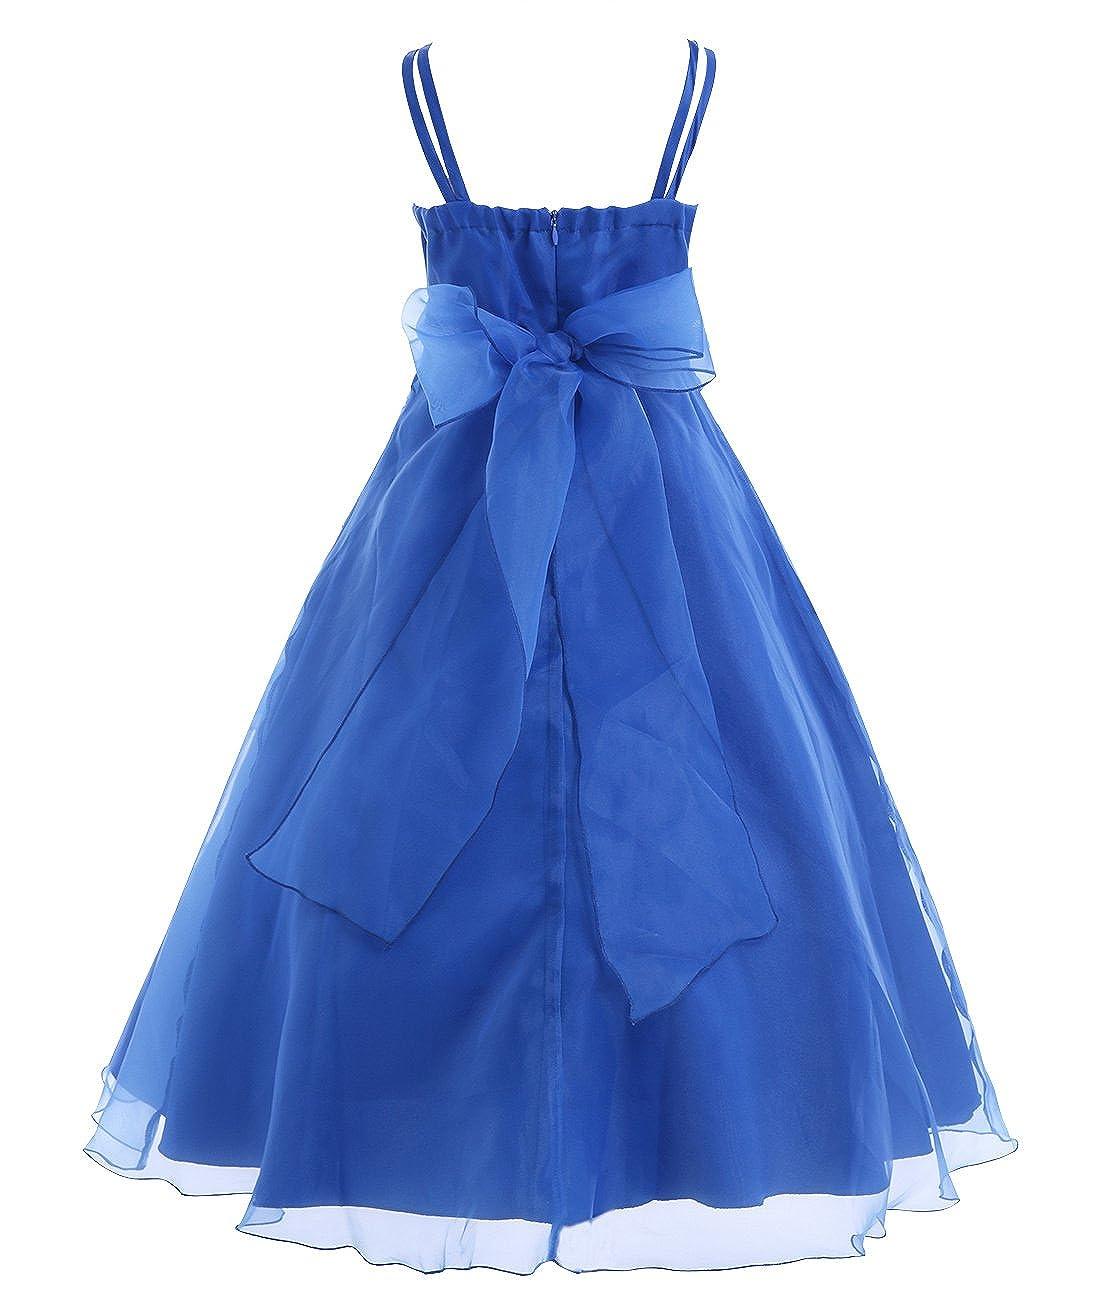 239591d249c Amazon.com  Freebily Girls Organza Flower Girl Dress Princess Pageant  Wedding Bridesmaid Birthday Party Dress  Clothing